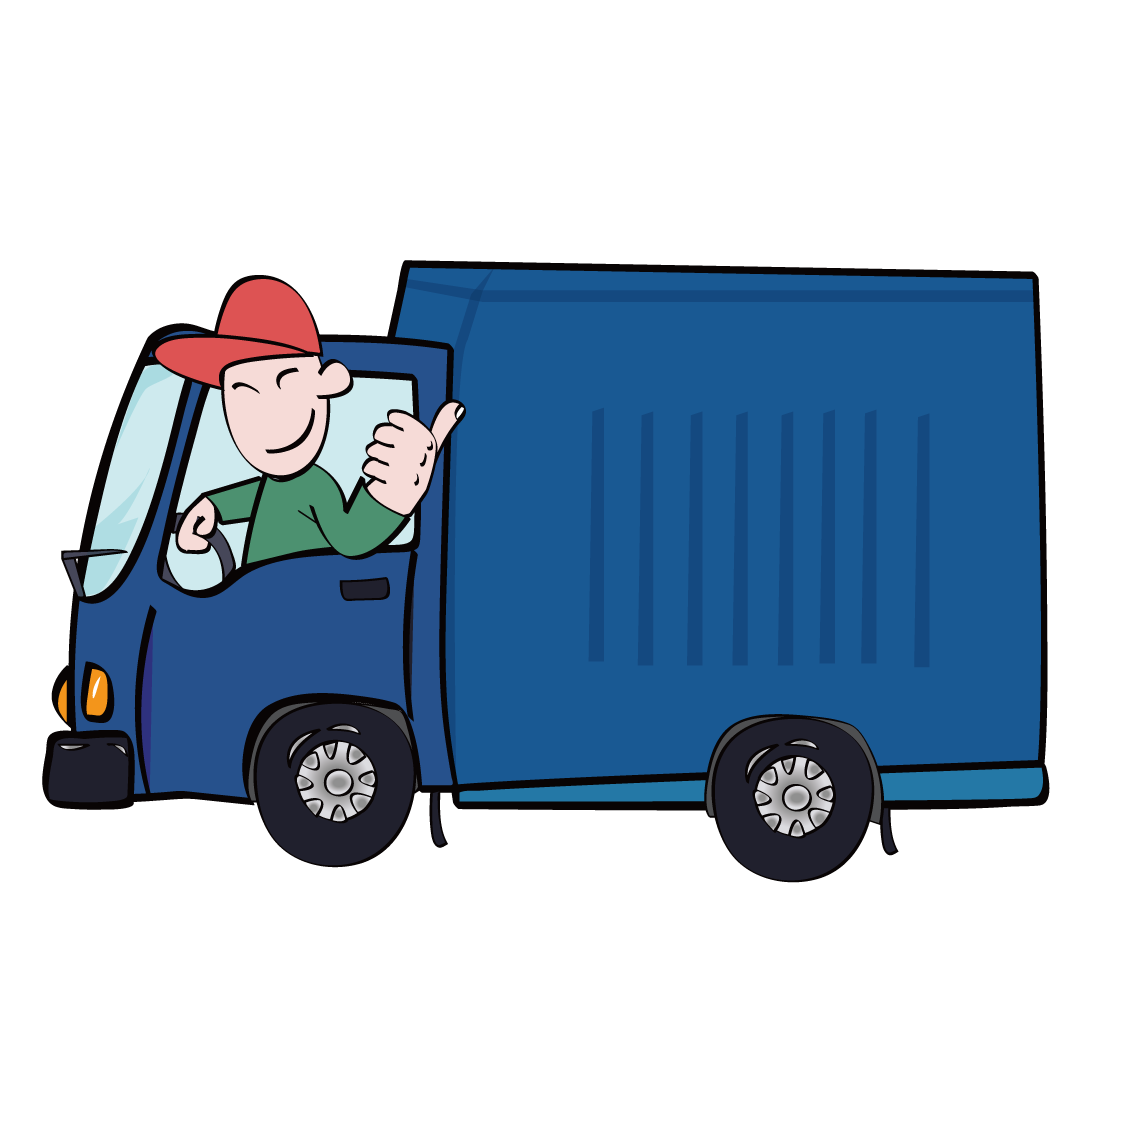 Open car door clipart clip stock Car Truck driver - Open truck driver 1134*1134 transprent Png Free ... clip stock